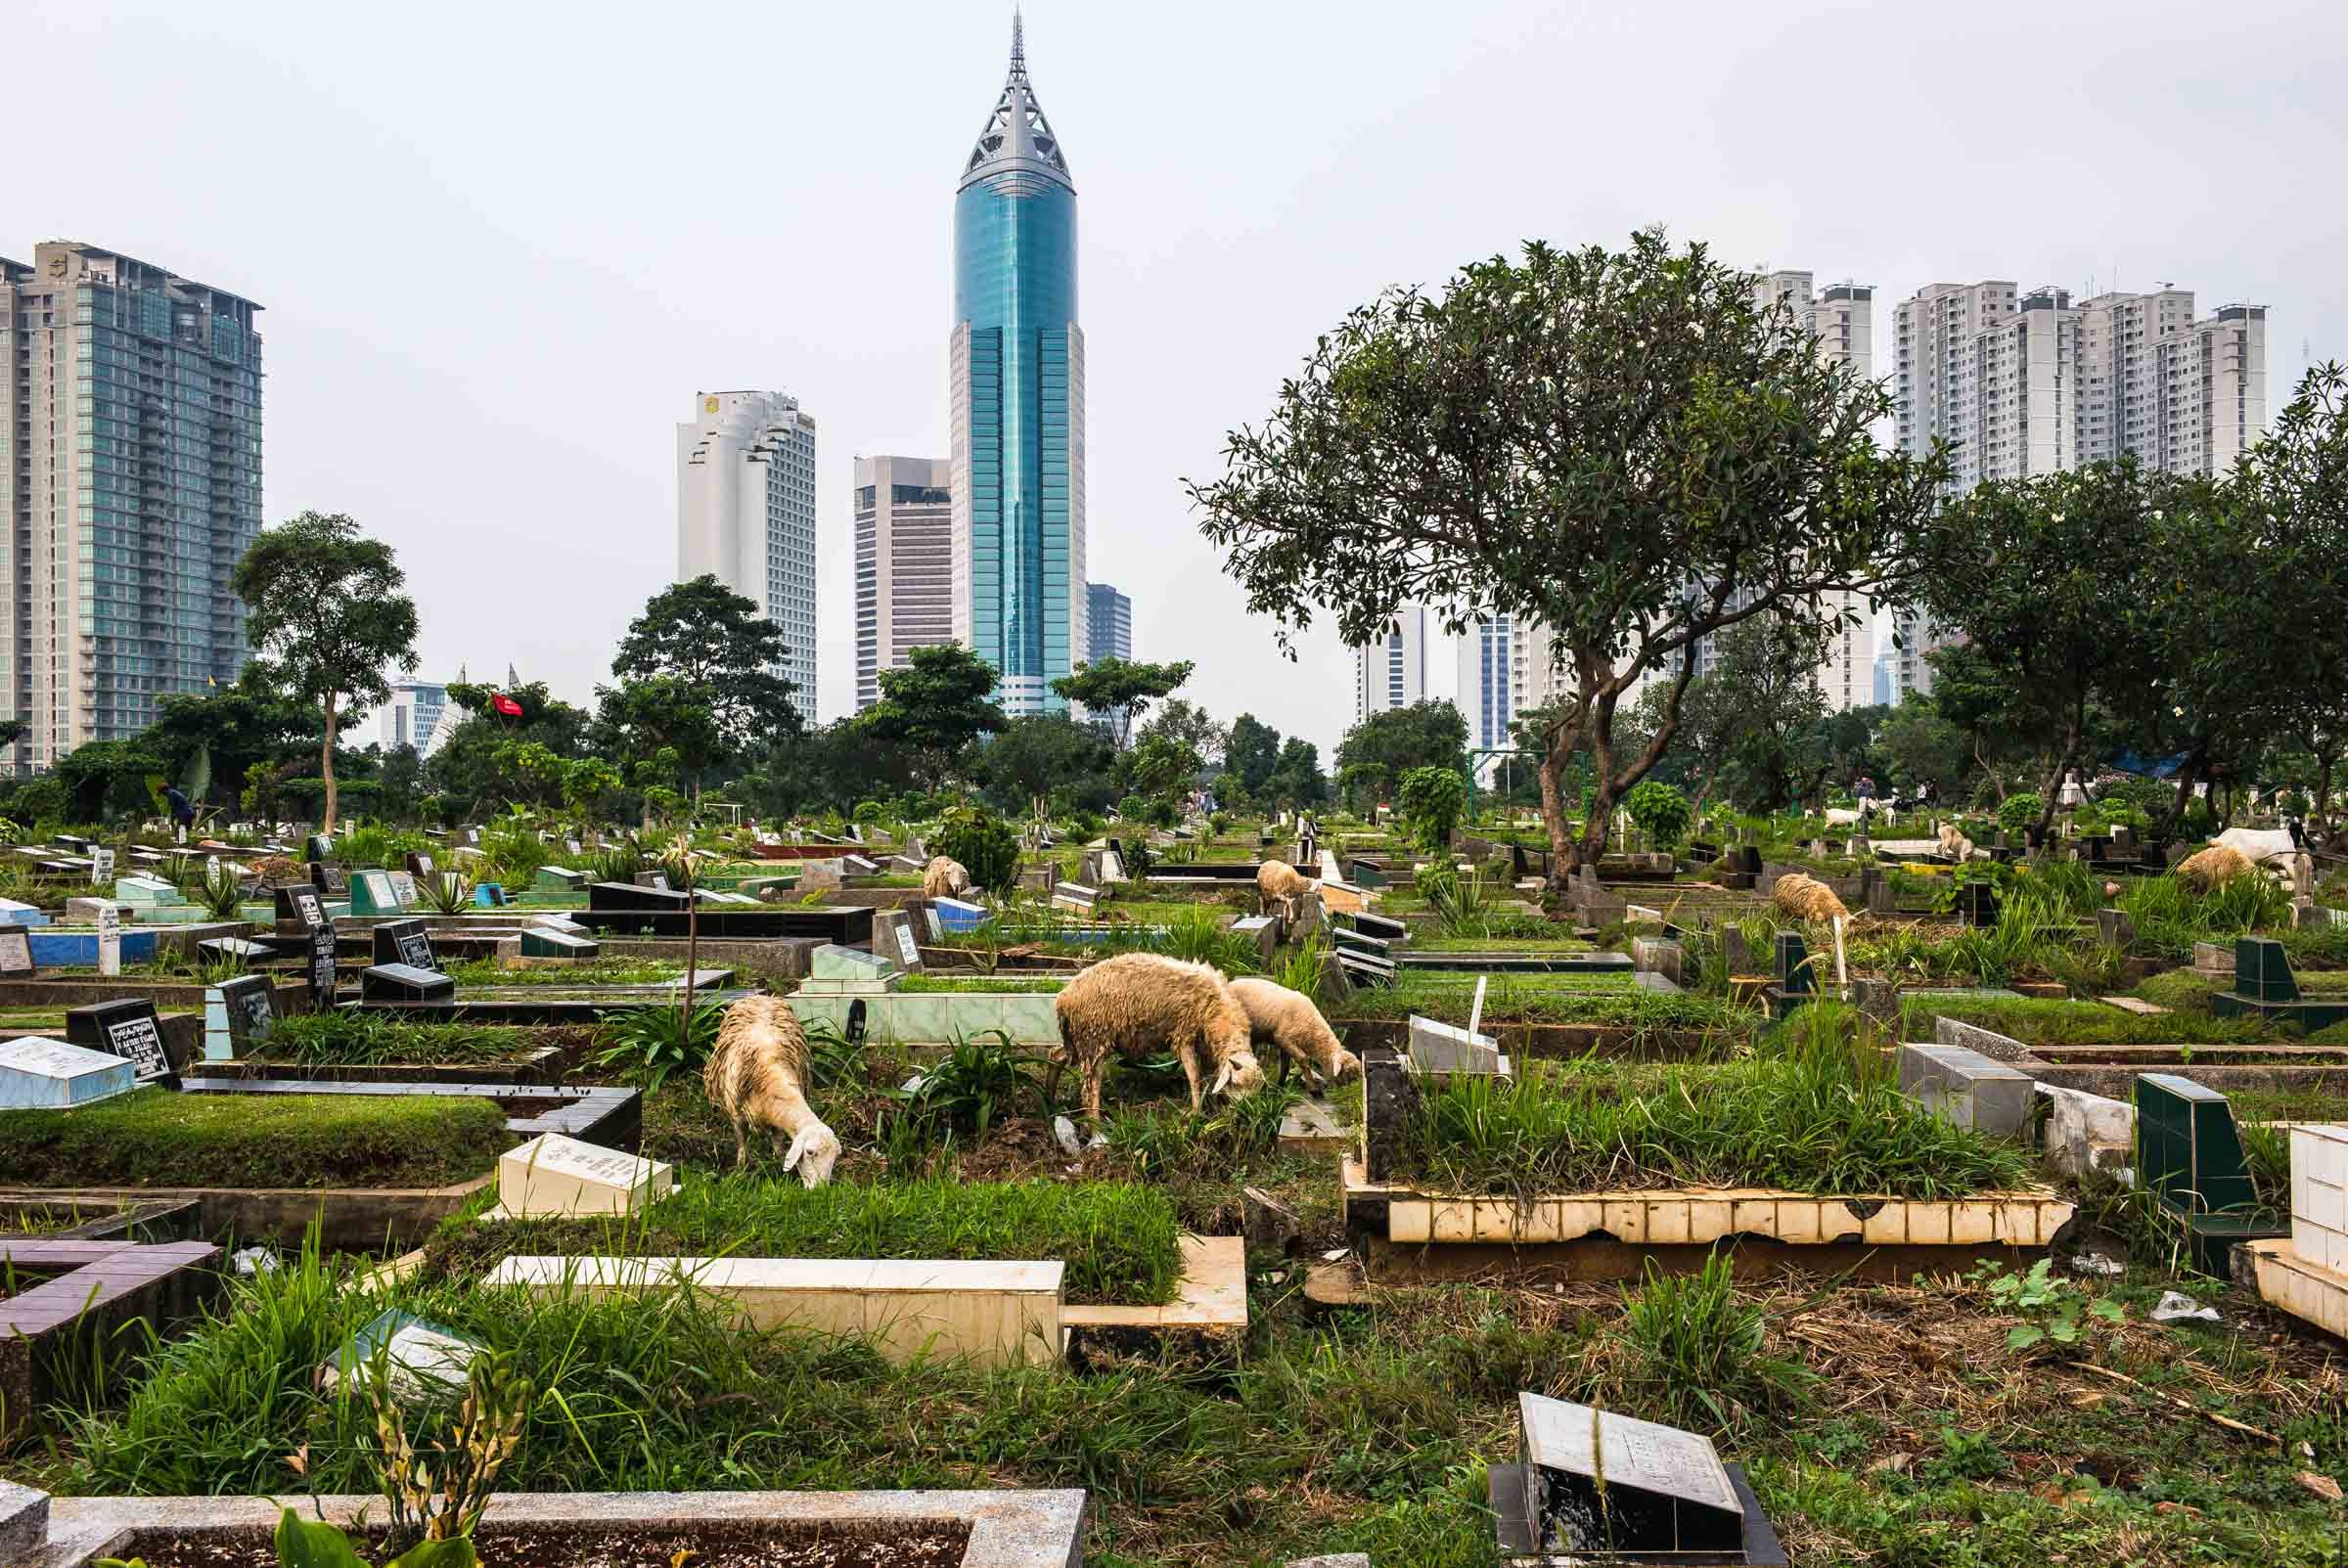 Jakarta: City of Contrasts